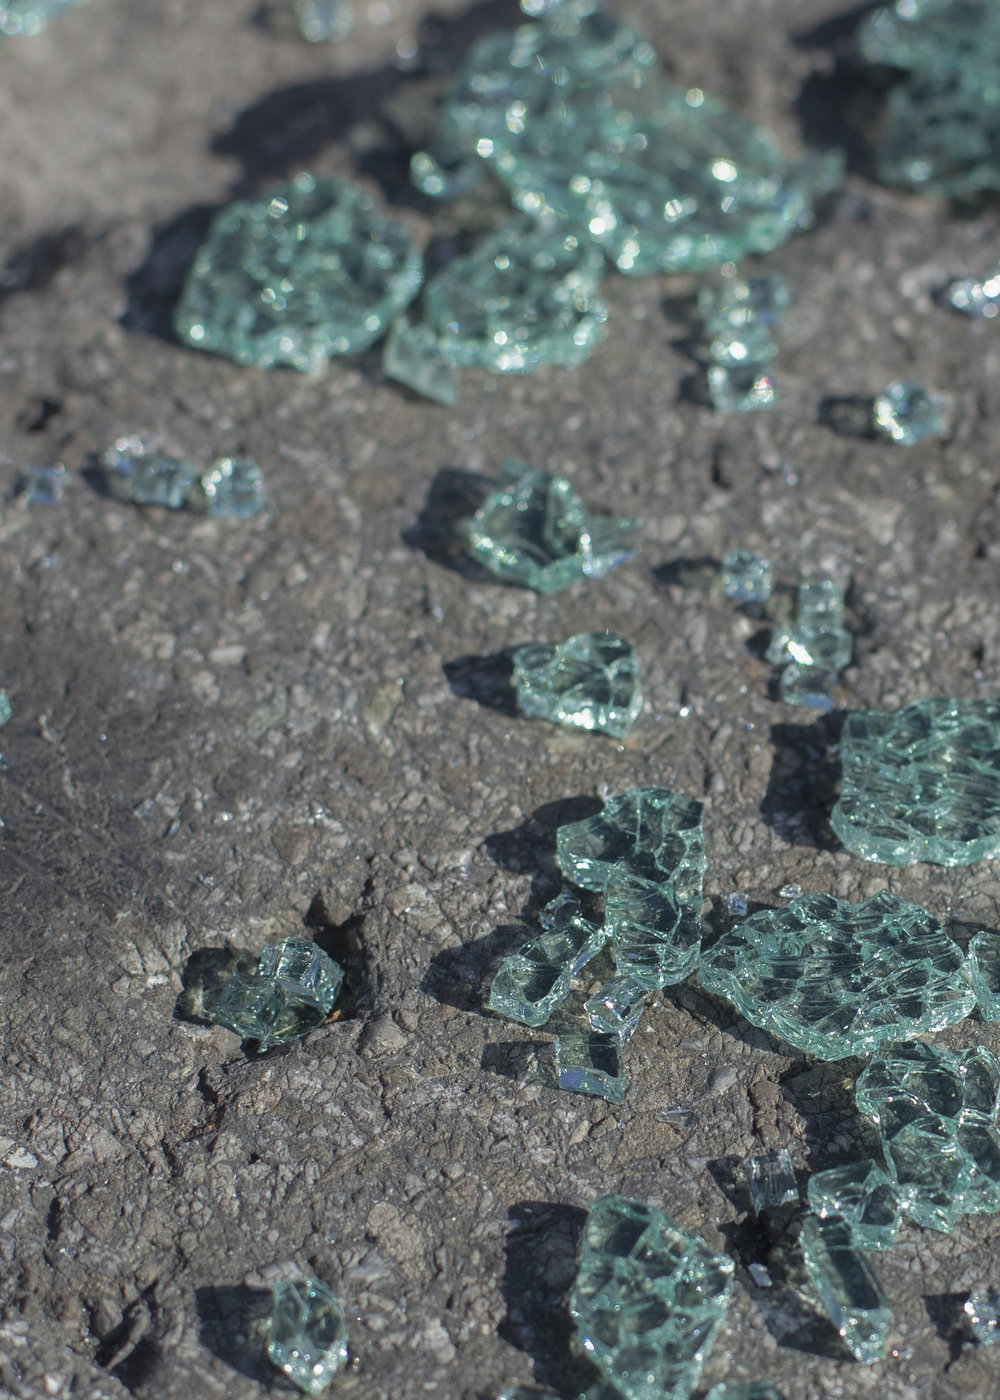 kristall1.jpg